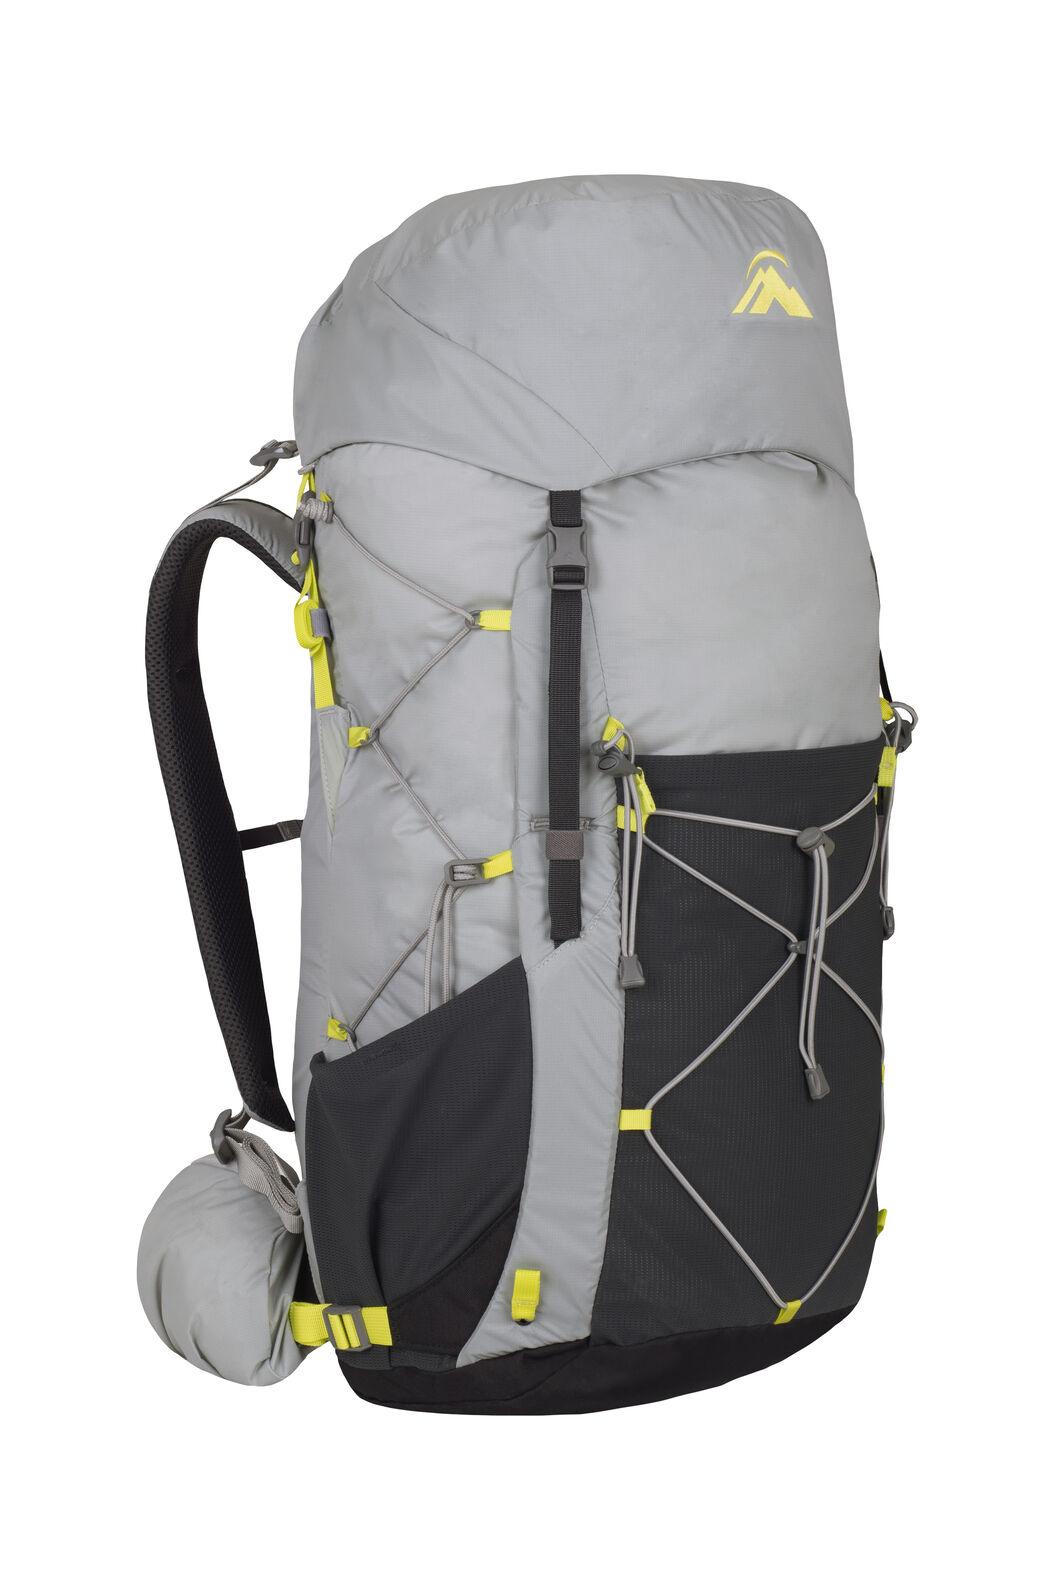 Macpac Fiord 1.1 40L Hiking Pack, Highway, hi-res